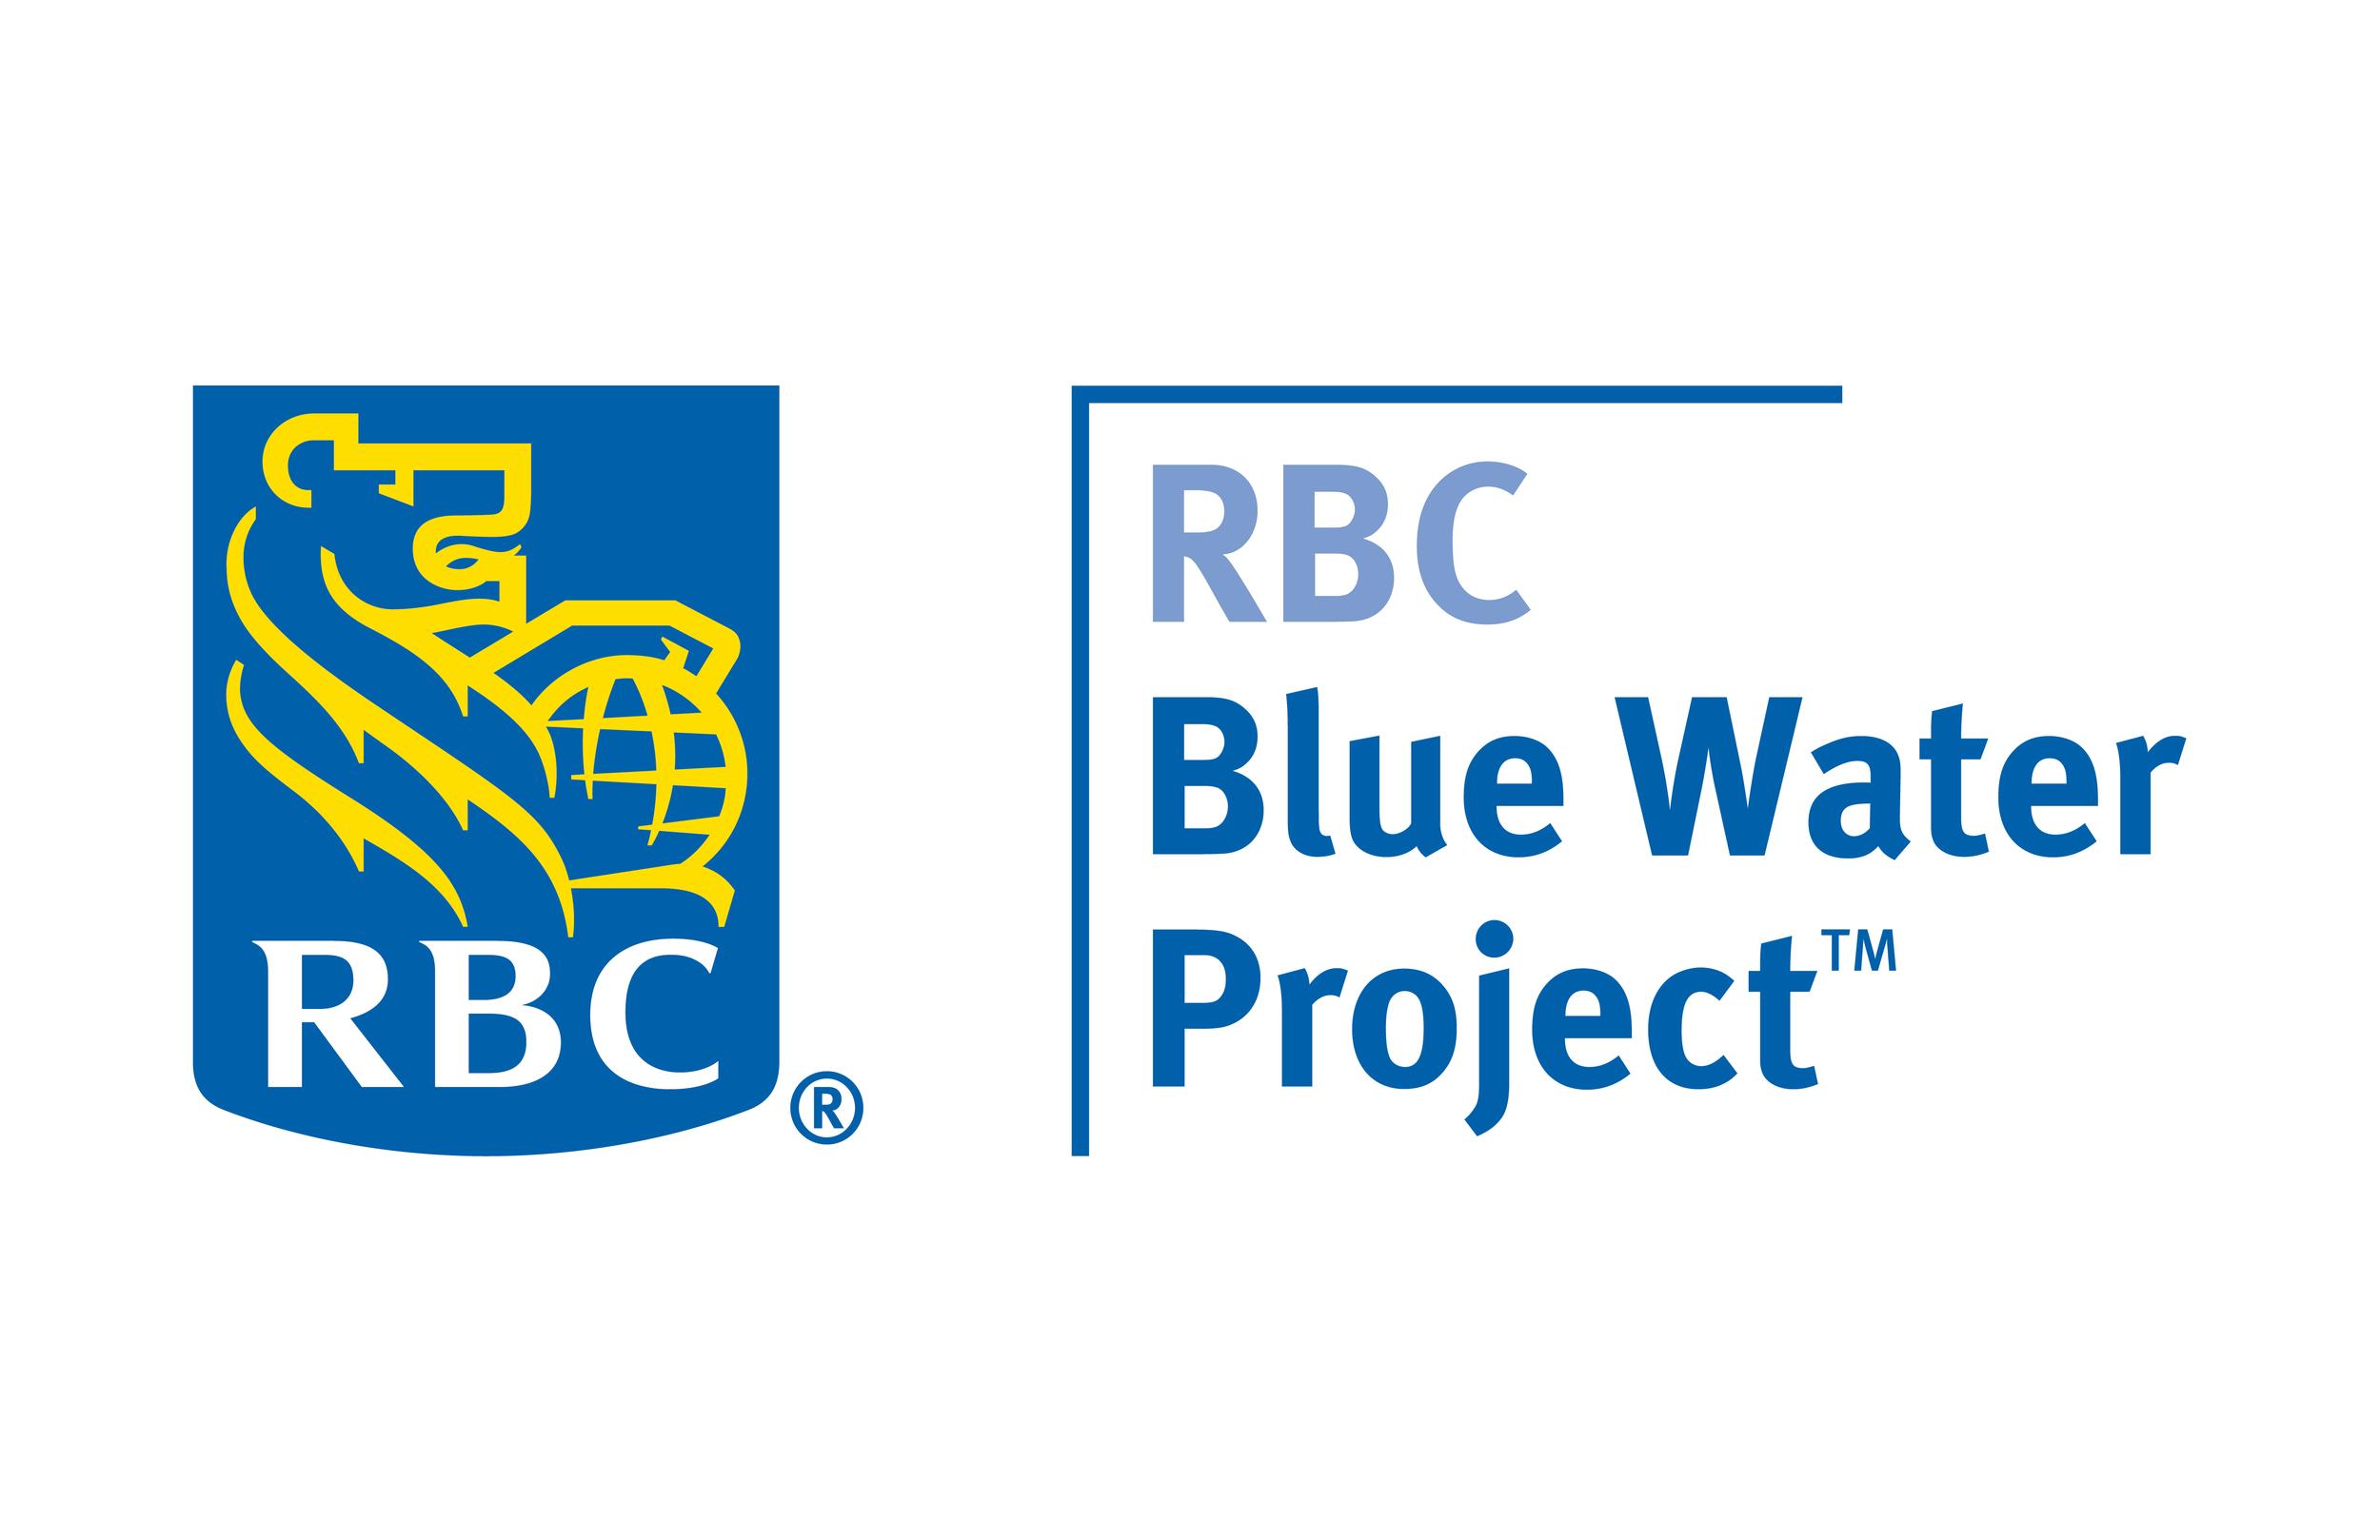 RBC_Blue_Water_Project_logo.jpg